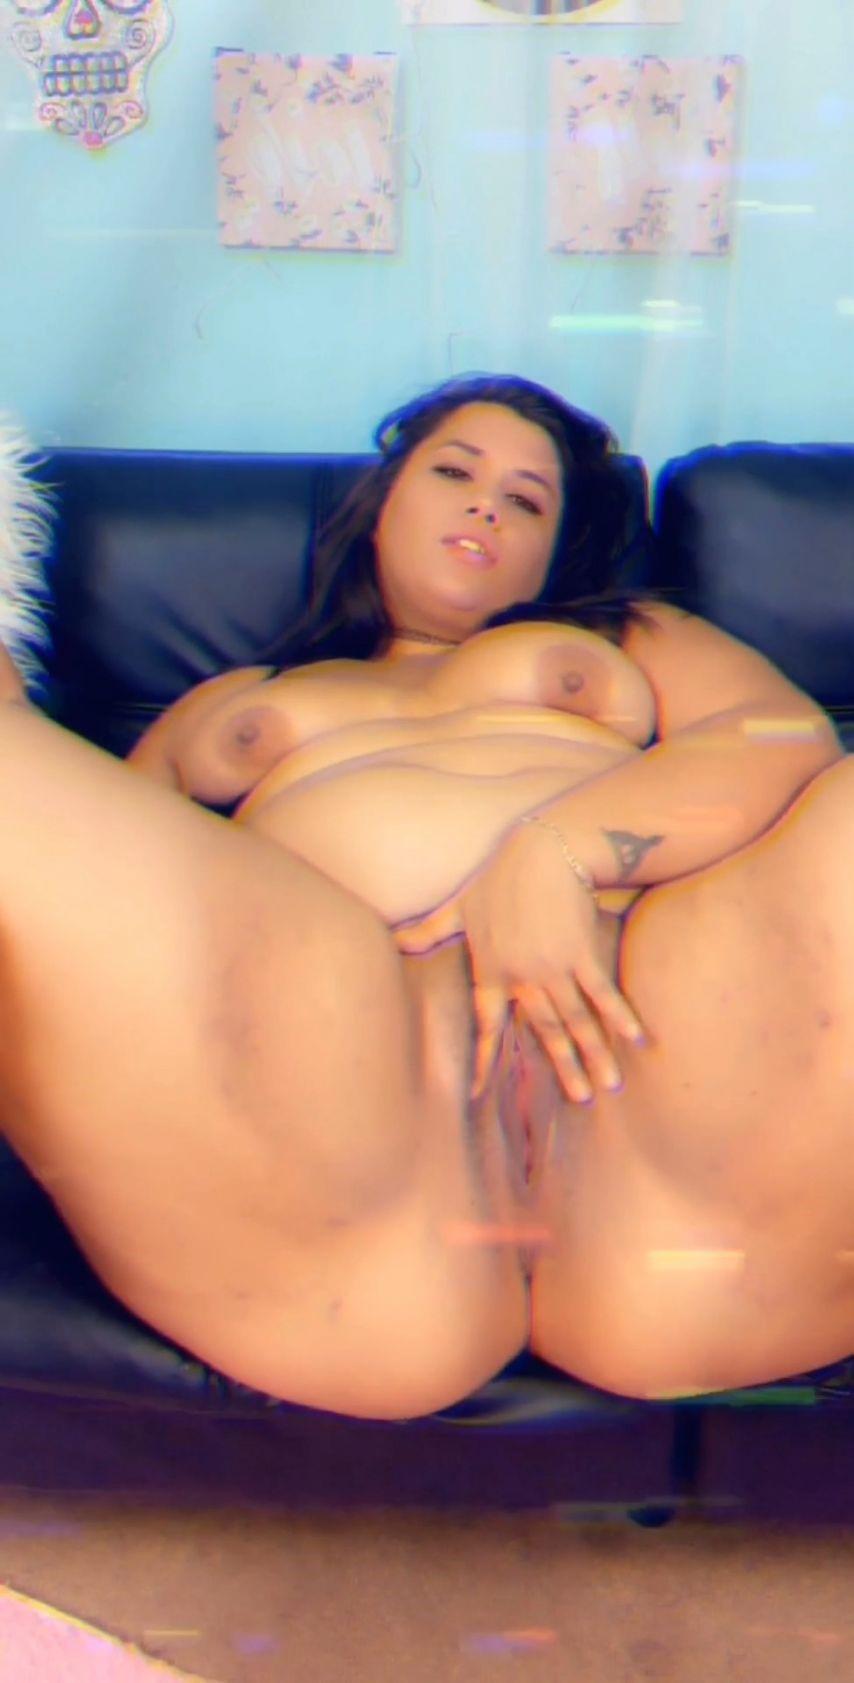 [SD] Breana Khalo Fucking Myself On Snapchat Breana Khalo - ManyVids-00:03:57 | BBW Goddess,Dildo Fucking,Pussy Spreading,Solo Female,Squirt - 125,4 MB